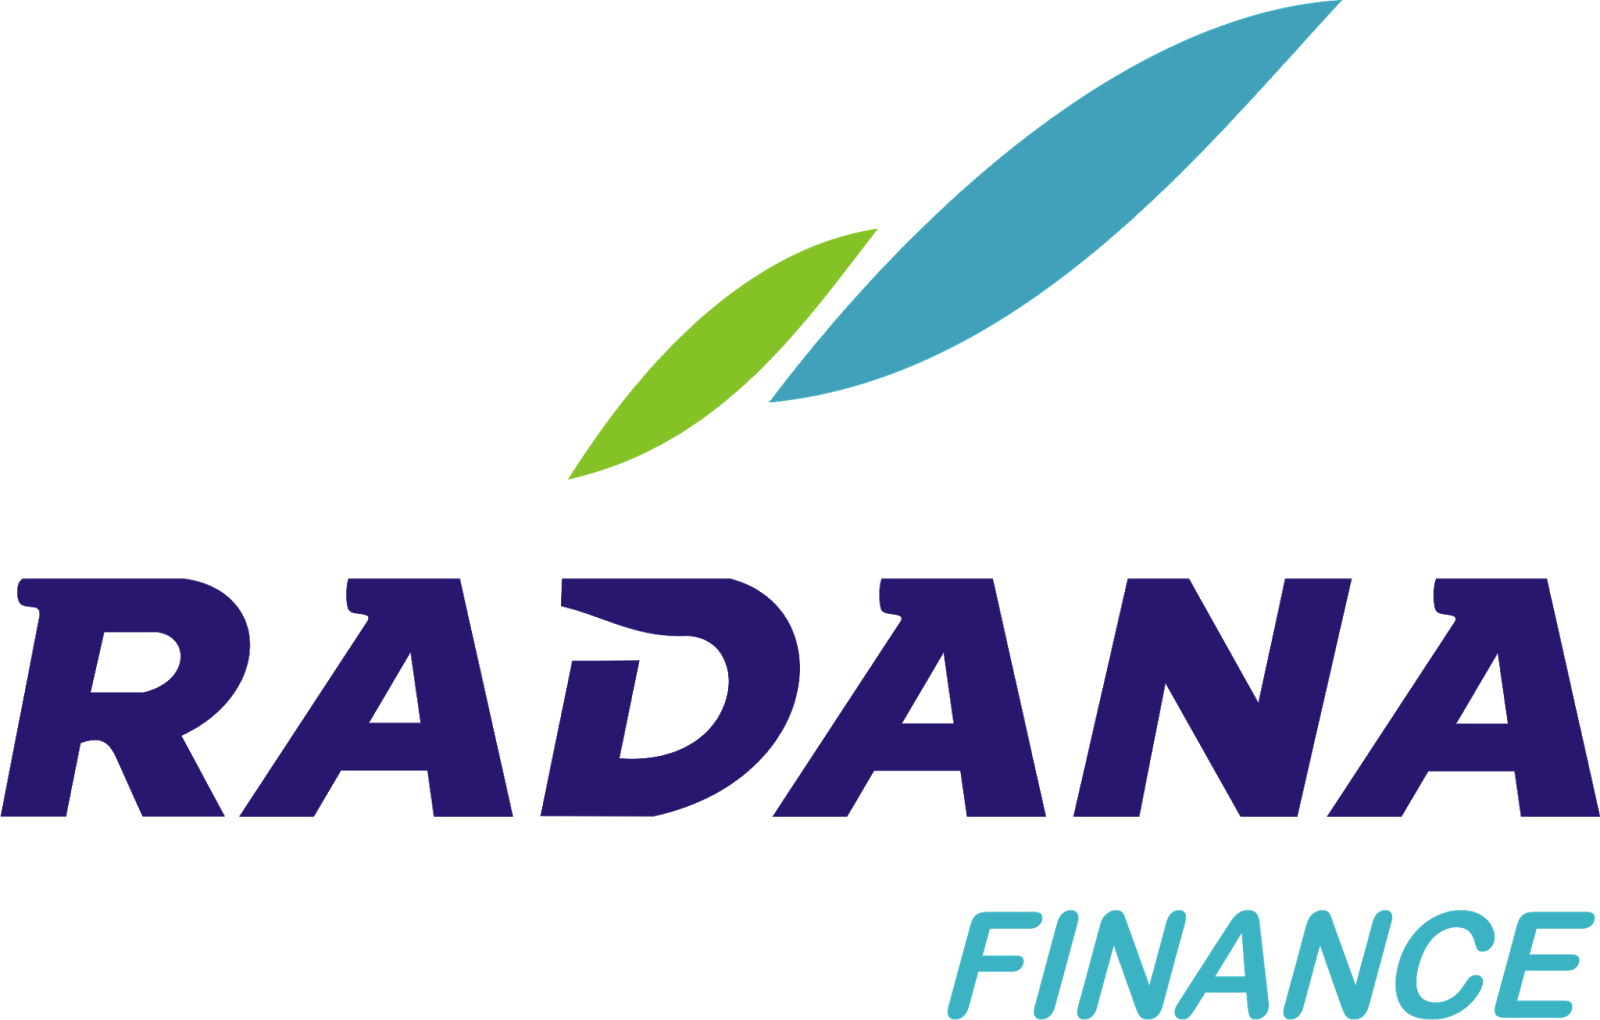 Lowongan D3/S1 PT. Radana Finance Desember 2014 Yogyakarta - ( Marketing Head, Field Surveyor & Colector dll )